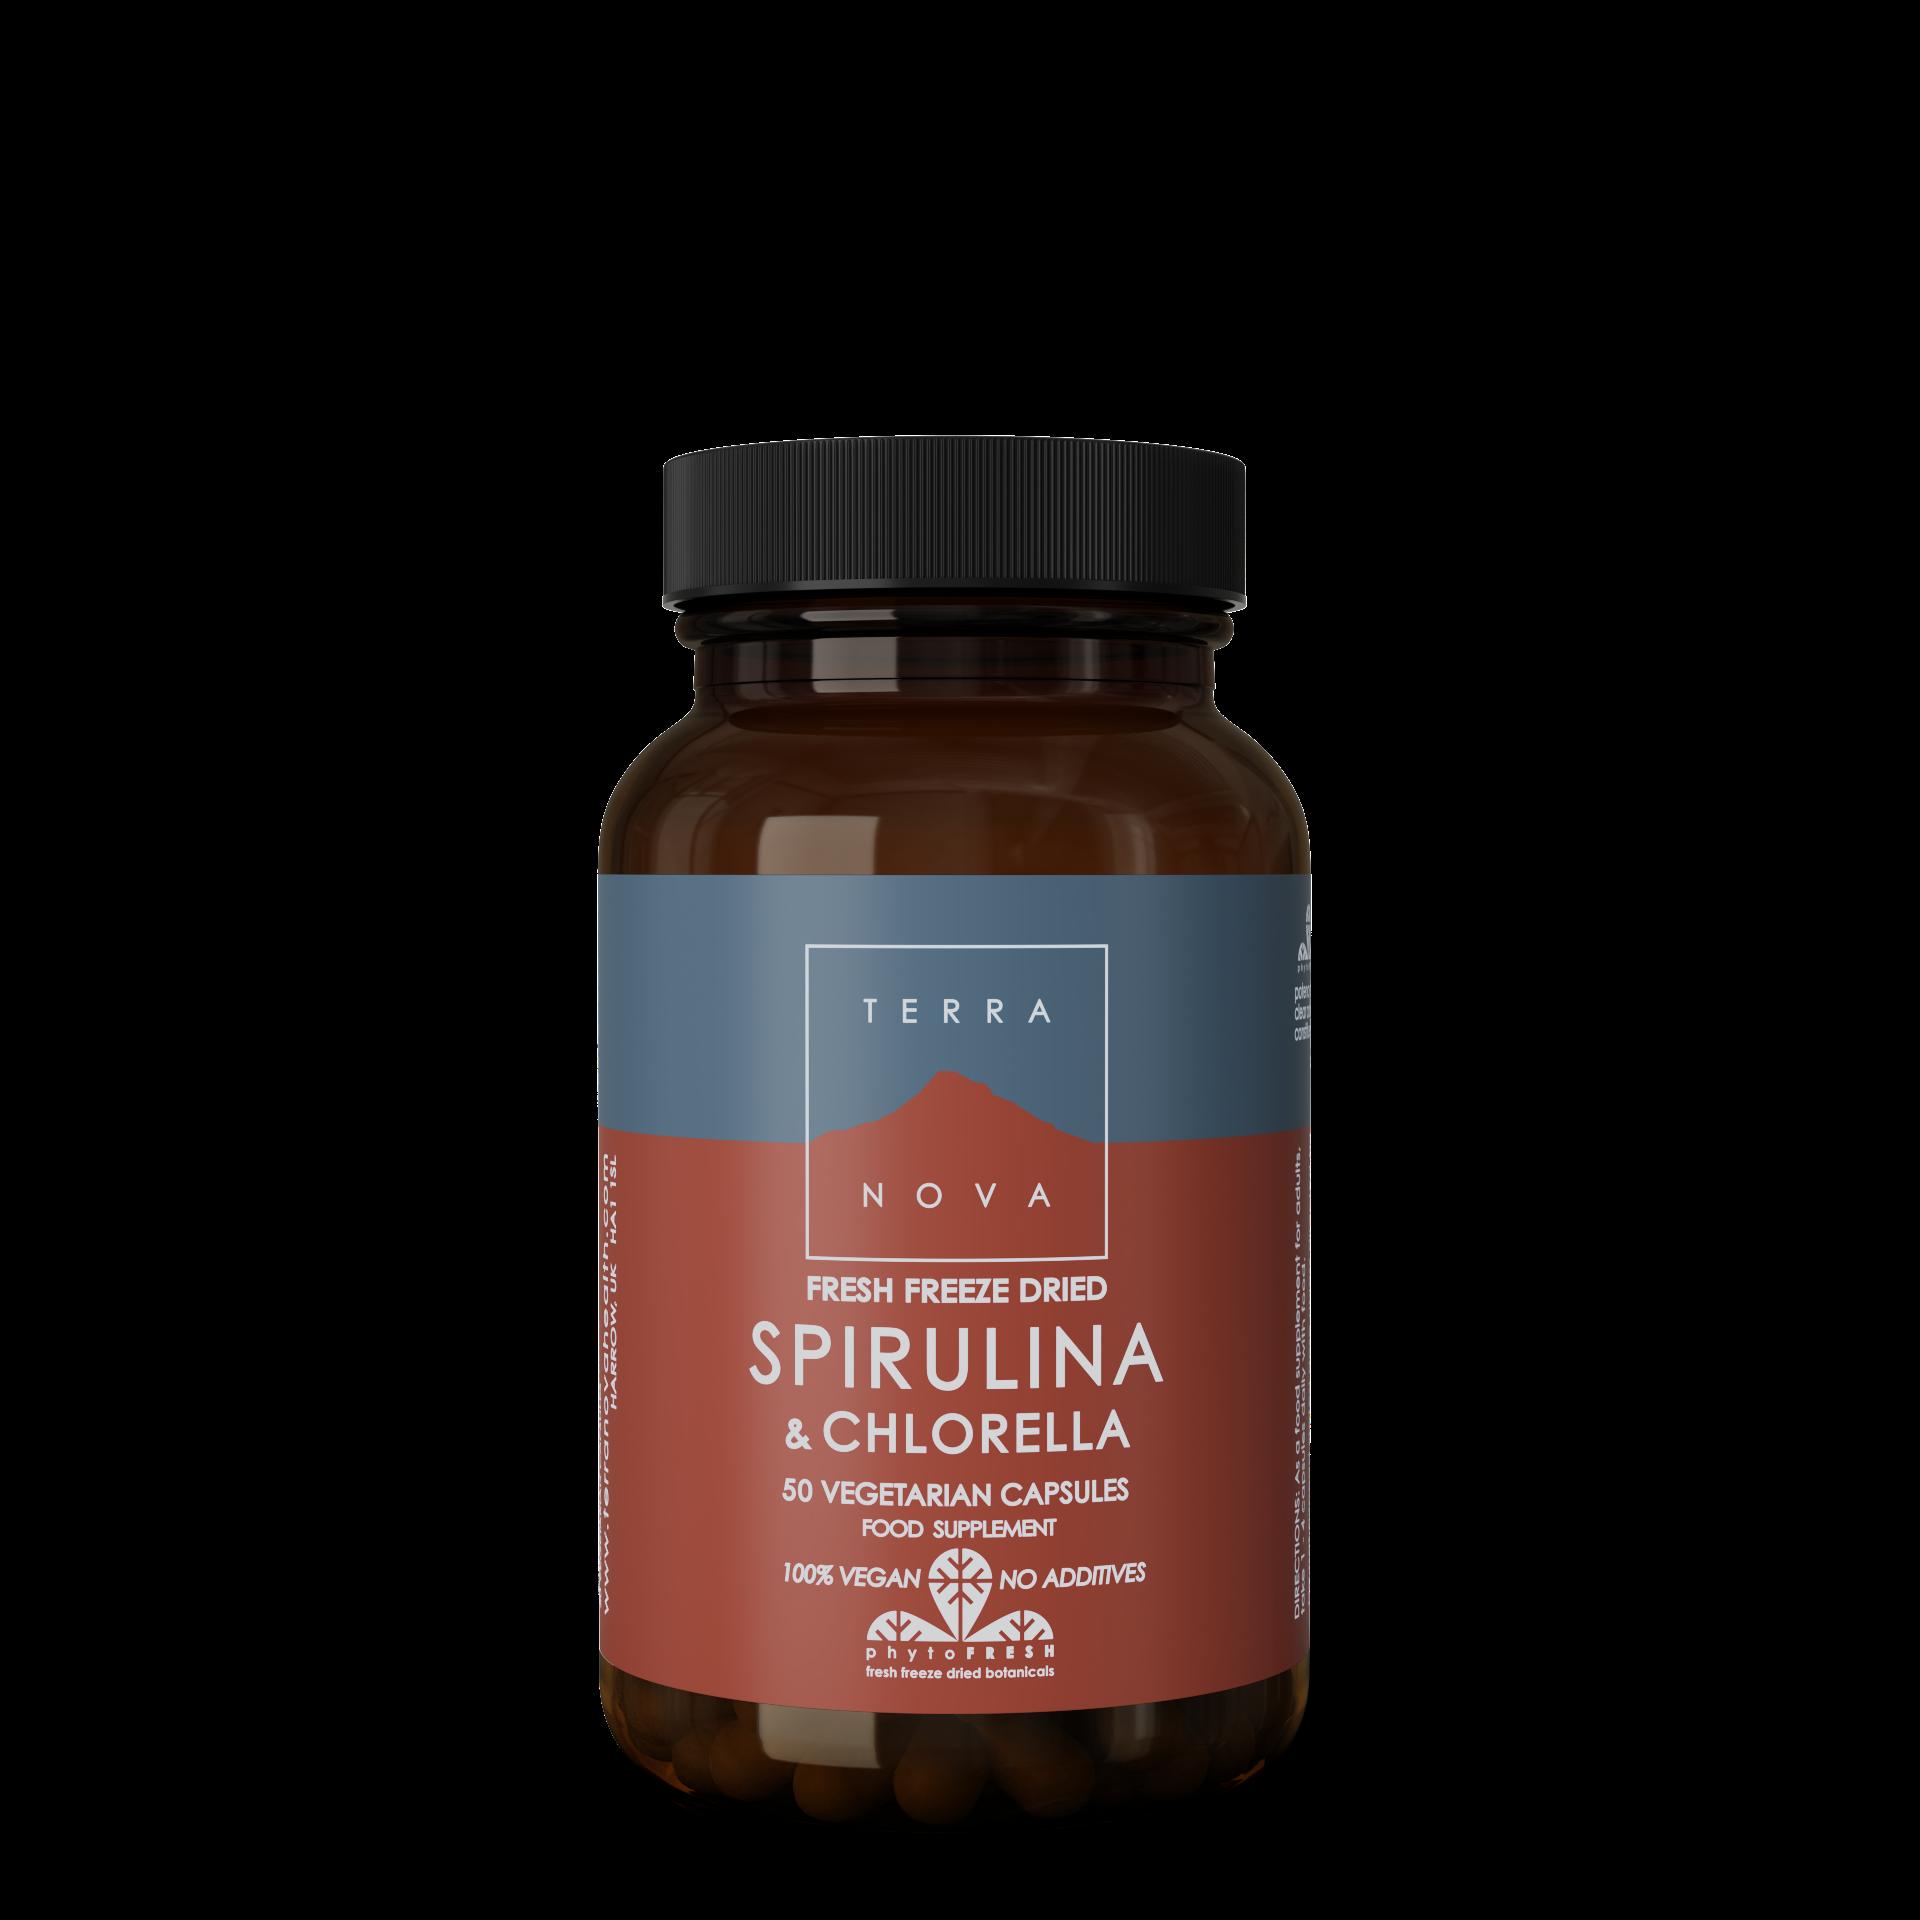 Spirulina & Chlorella Capsules 50's (Currently Unavailable)